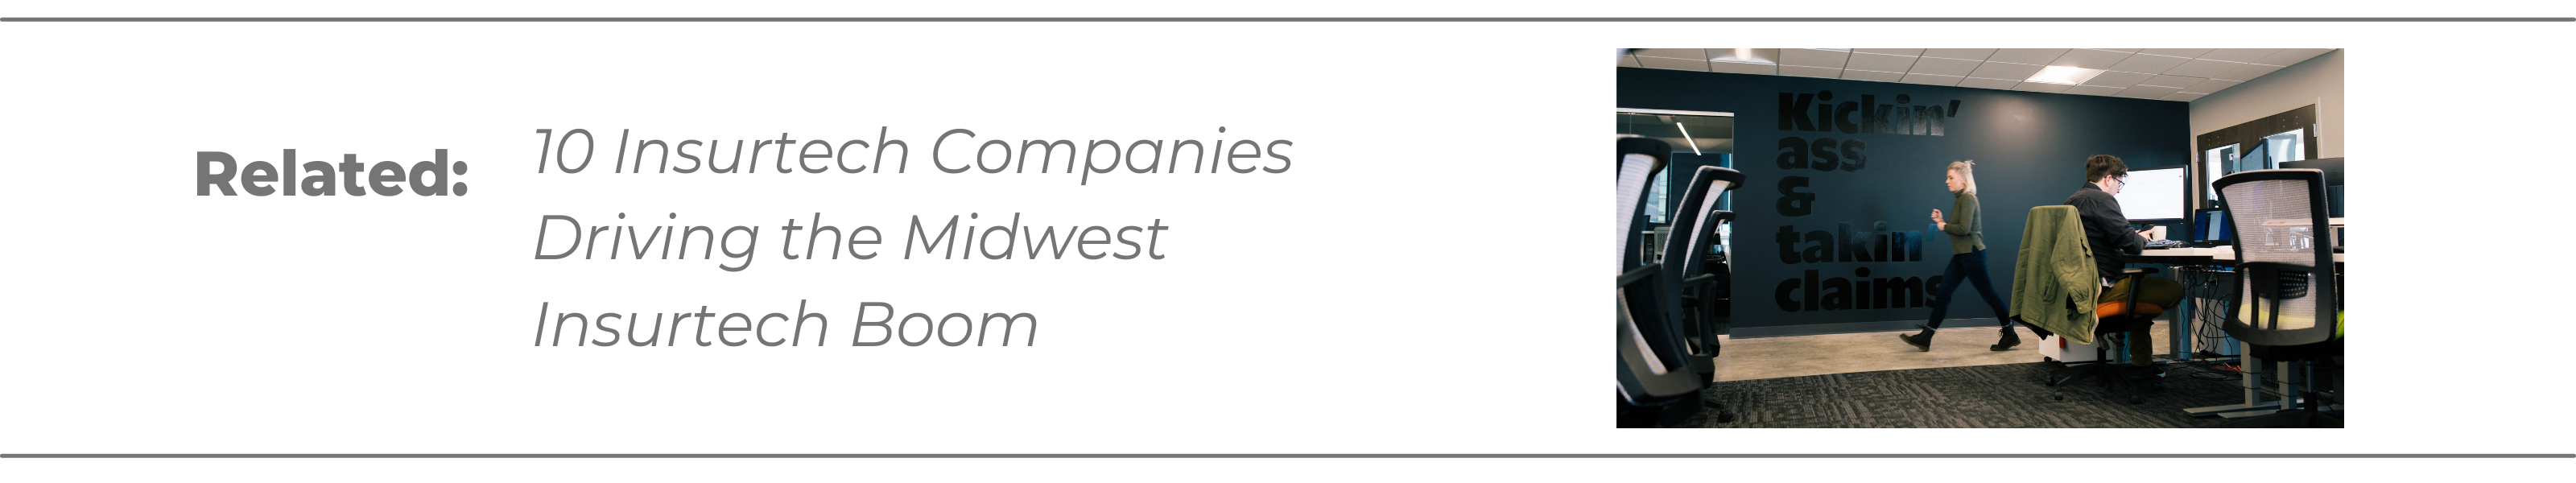 midwest-insurtech-startup-boom